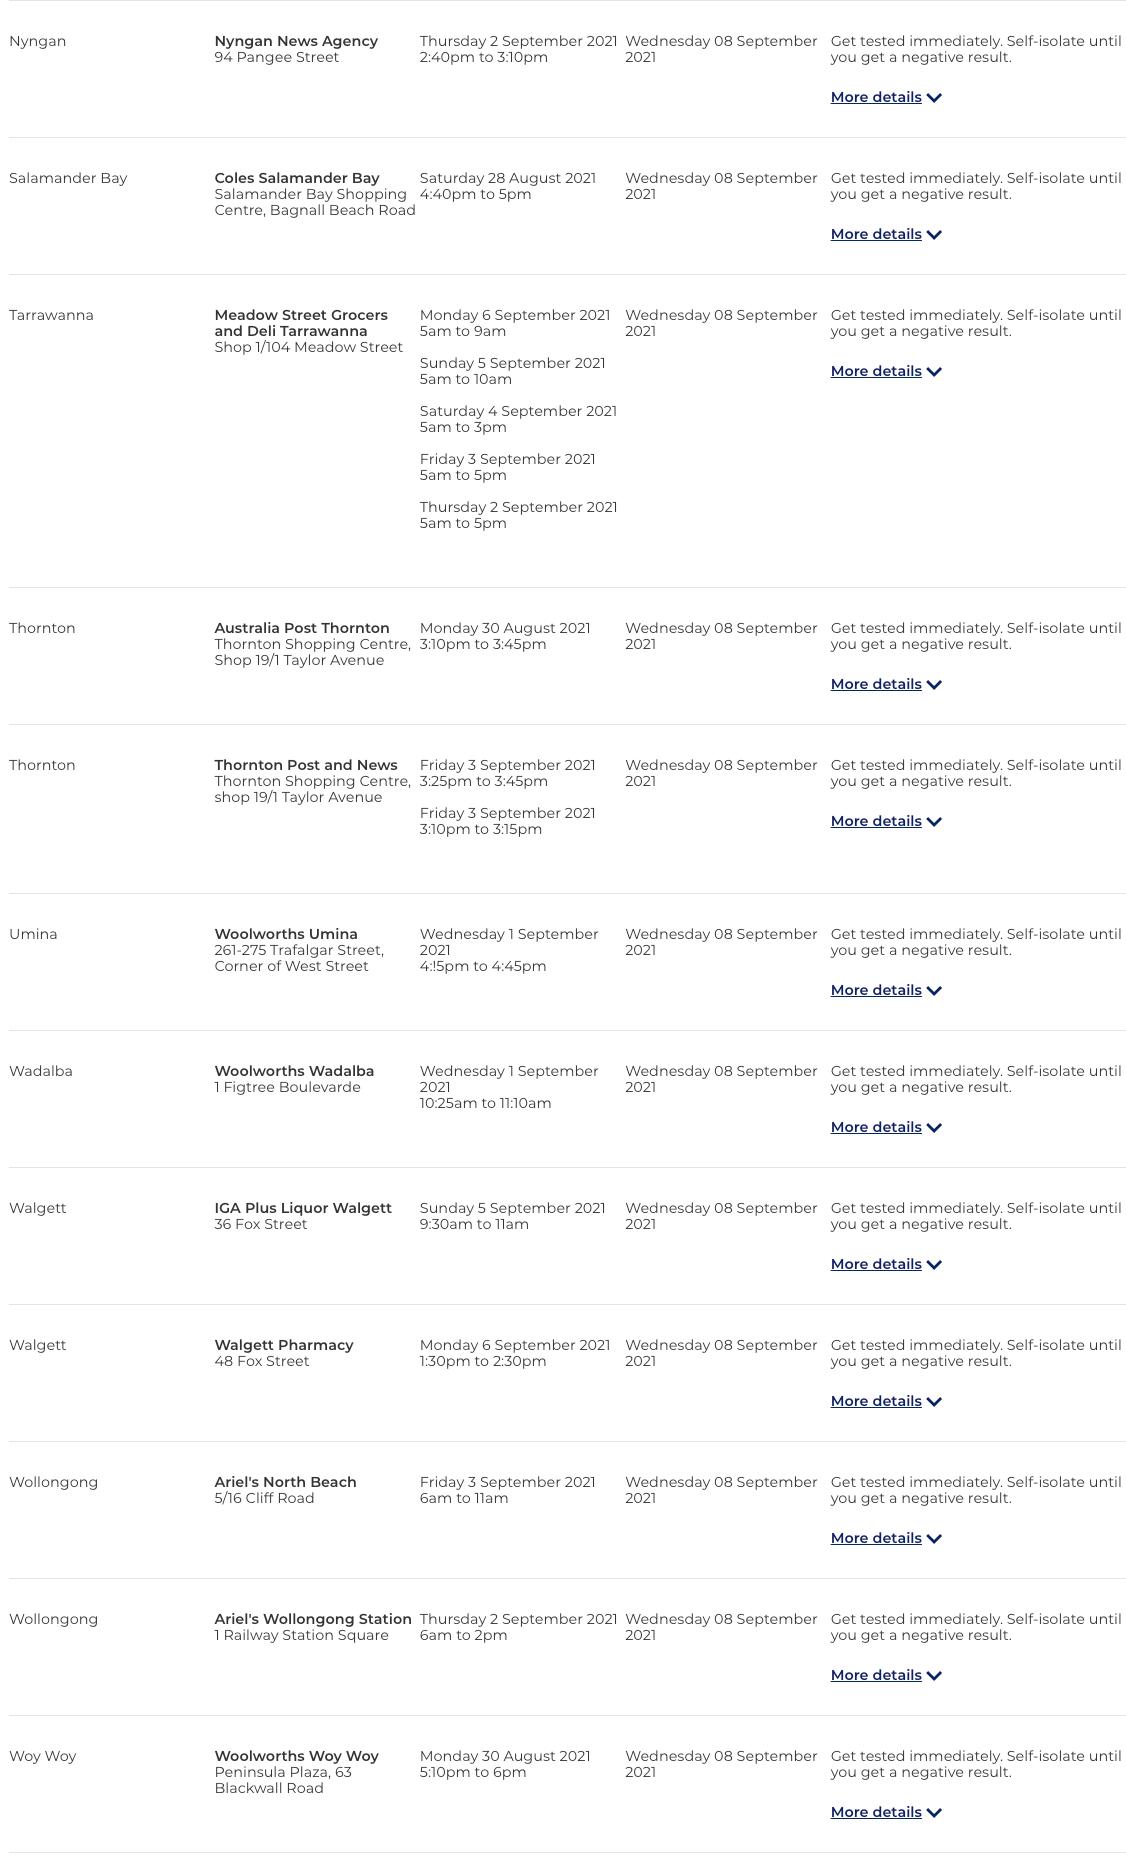 www.nsw.gov.au_covid-19_nsw-covid-19-case-locations_case-locations (17).png